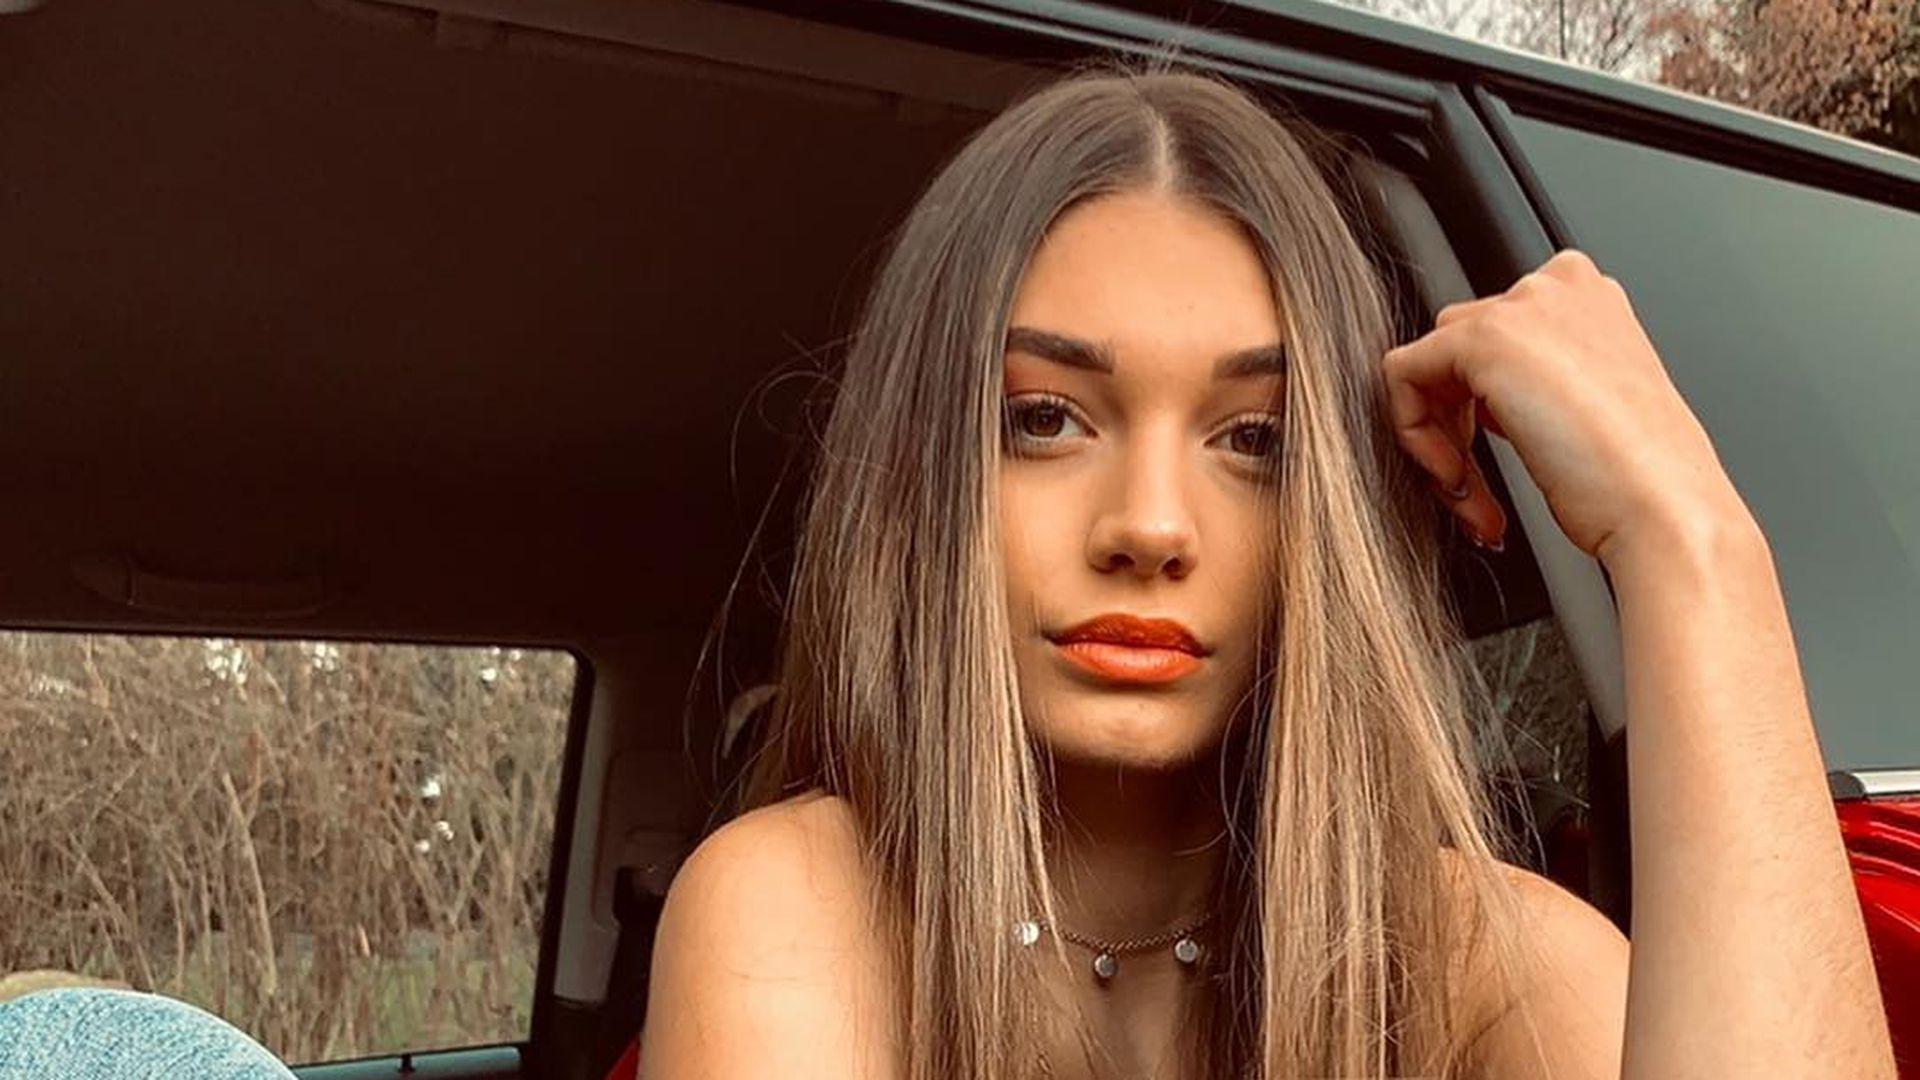 Sarah Gntm